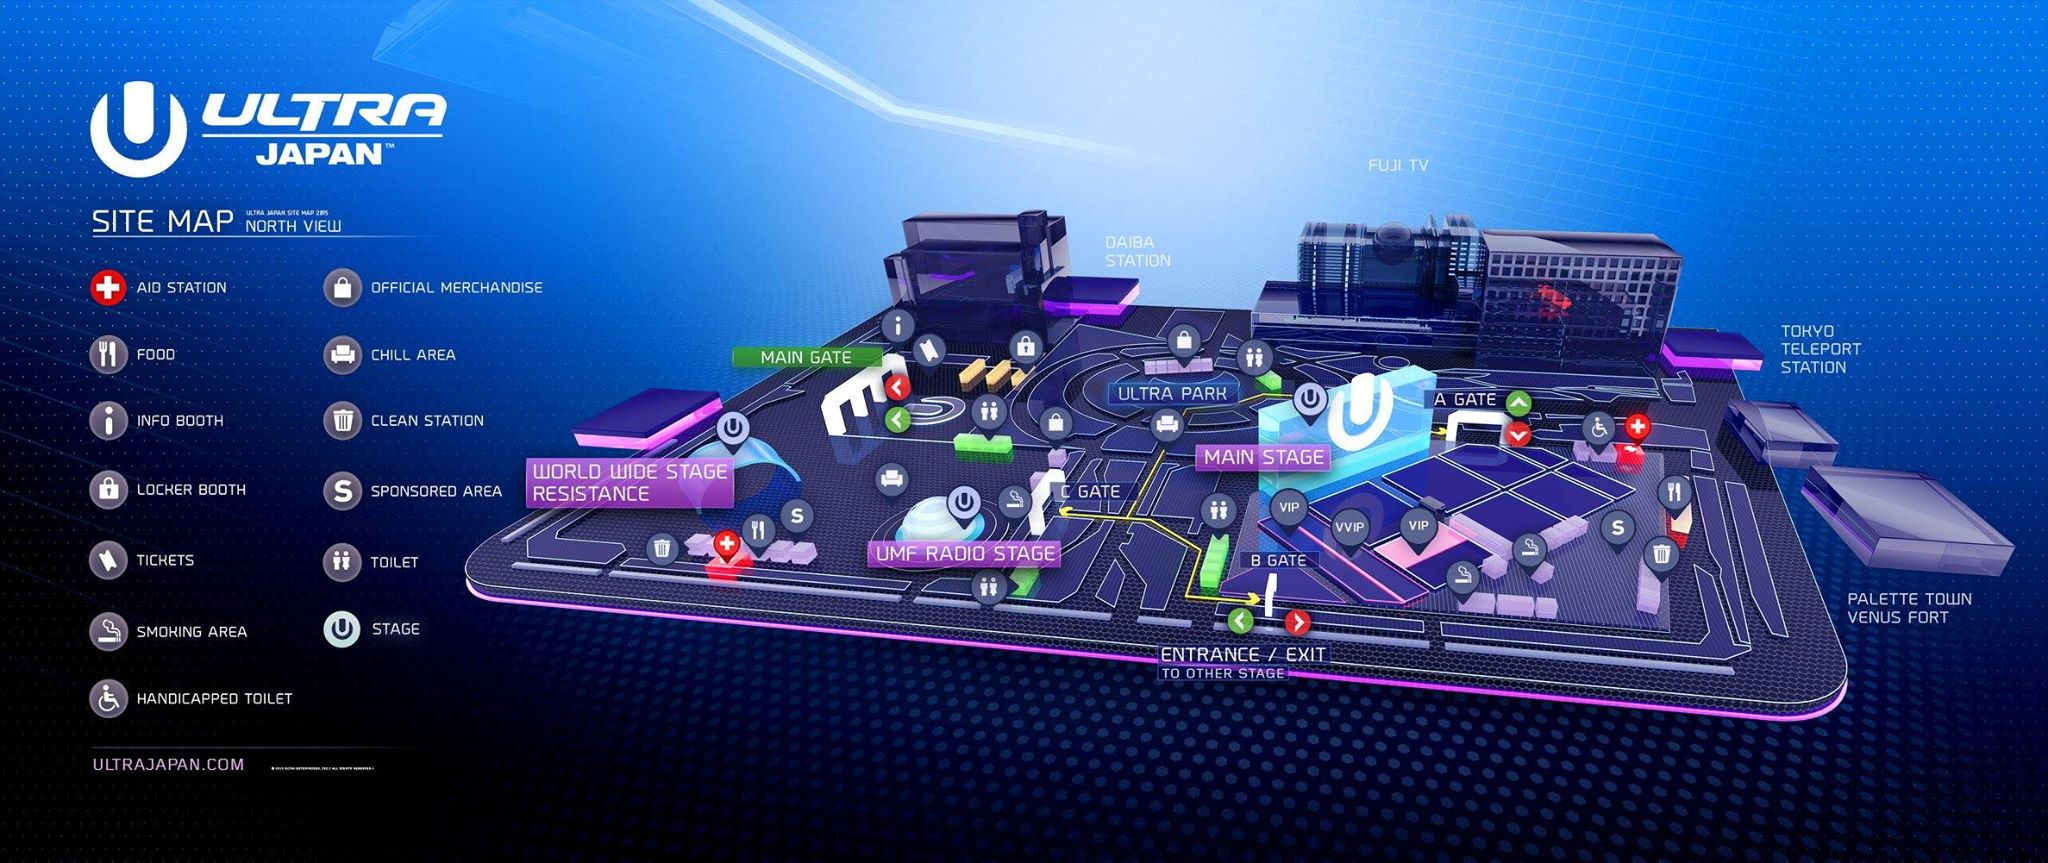 ULTRA JAPAN 2015 SITE MAP